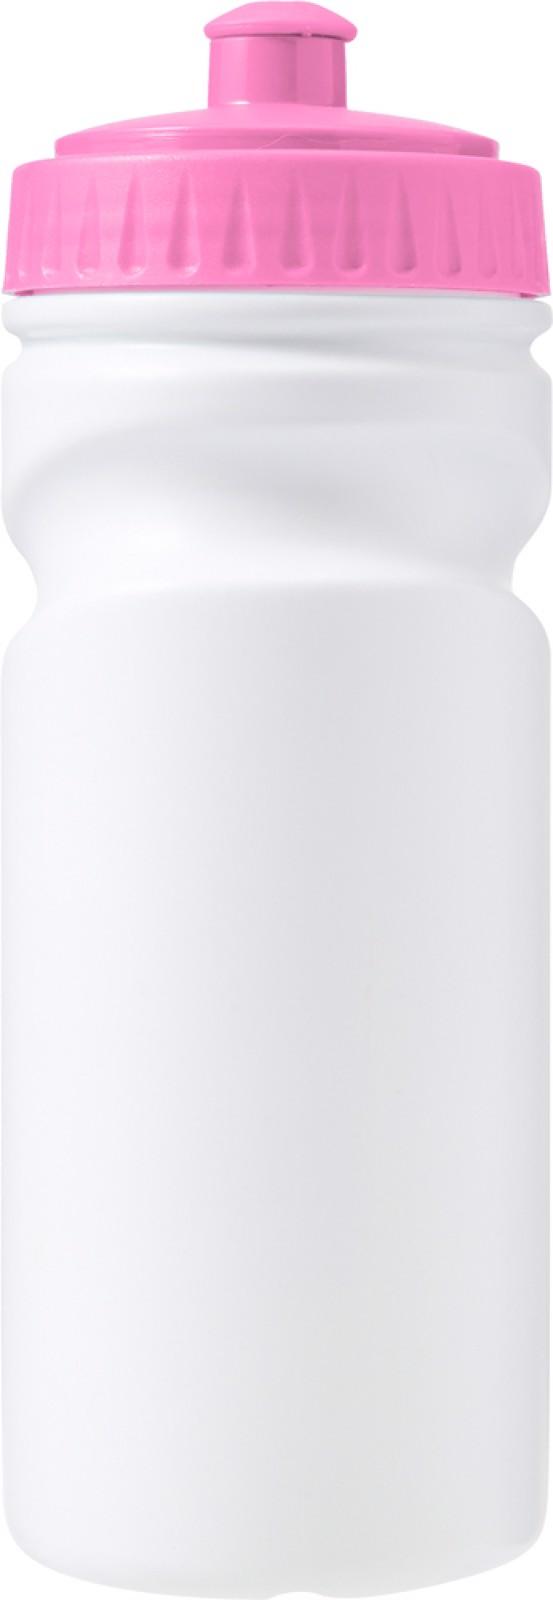 HDPE bottle - Pink